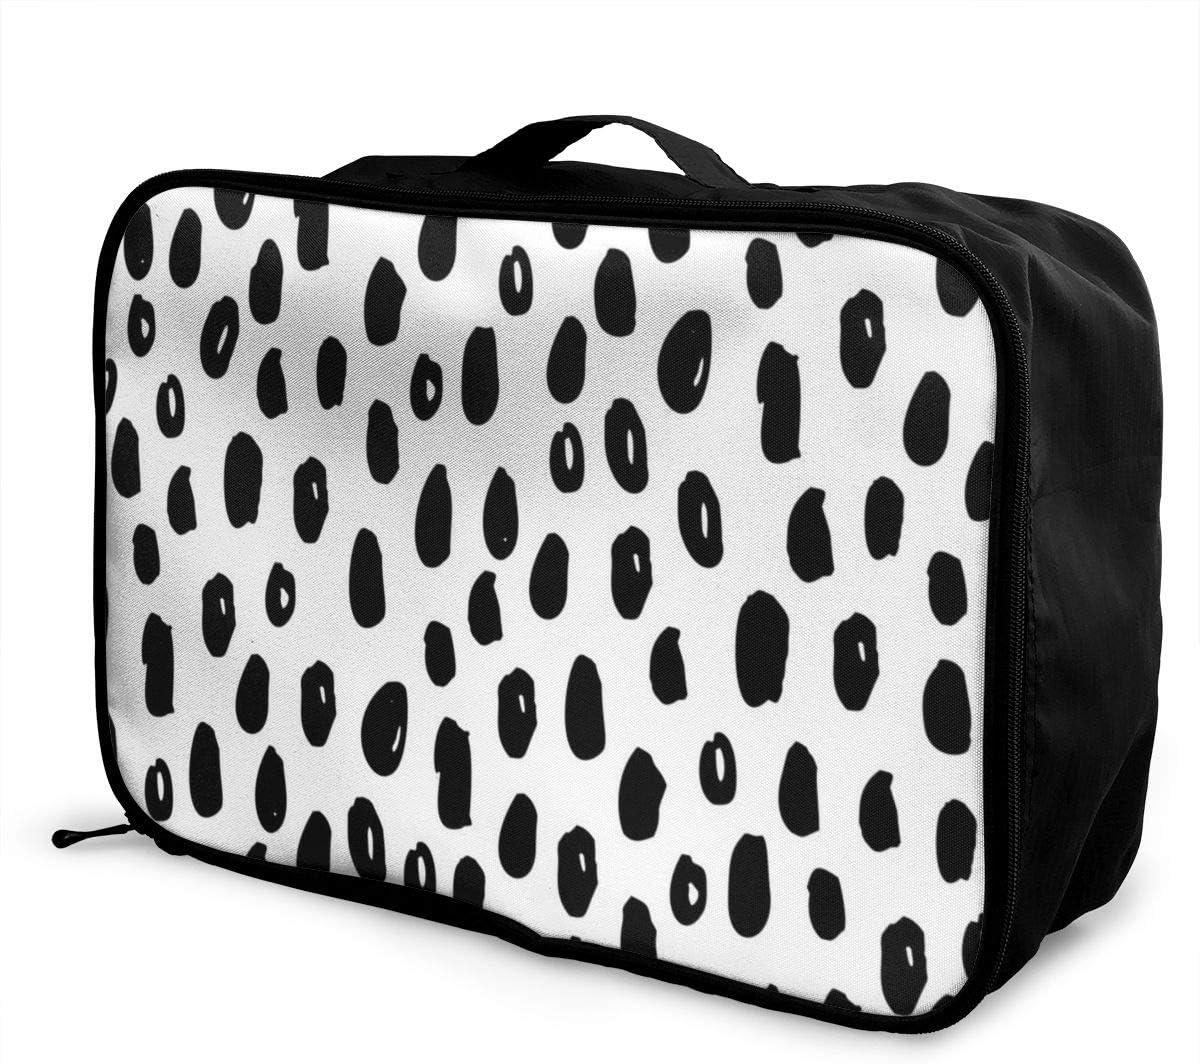 Yunshm Fashion Modern Brush Point Personalized Trolley Handbag Waterproof Unisex Large Capacity For Business Travel Storage